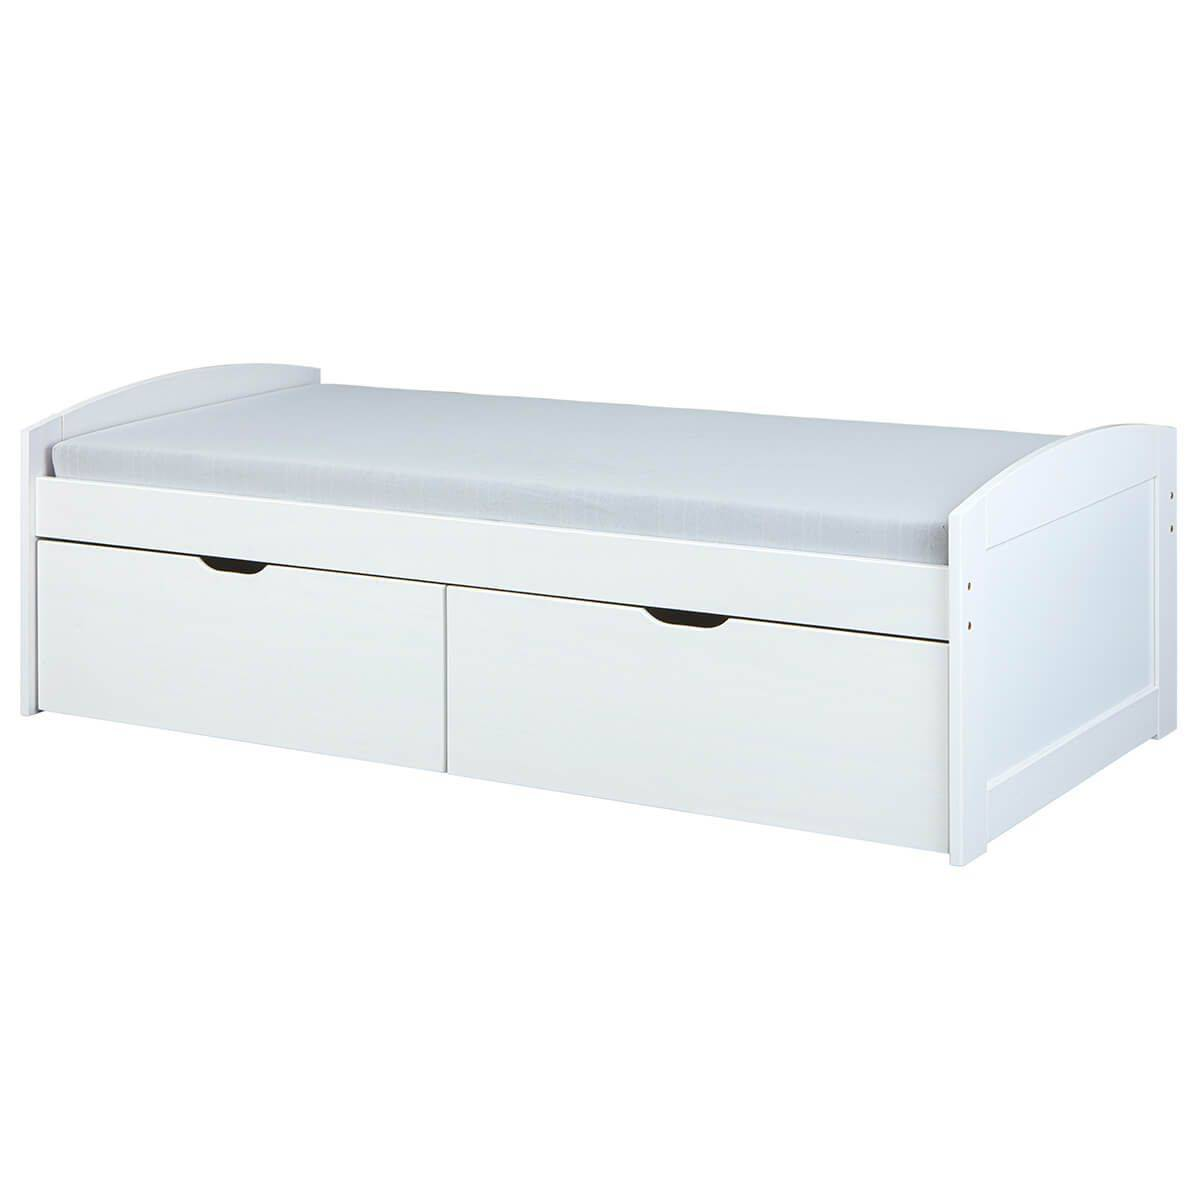 Altobuy Lit  90x200cm 2 tiroirs vernis blanc